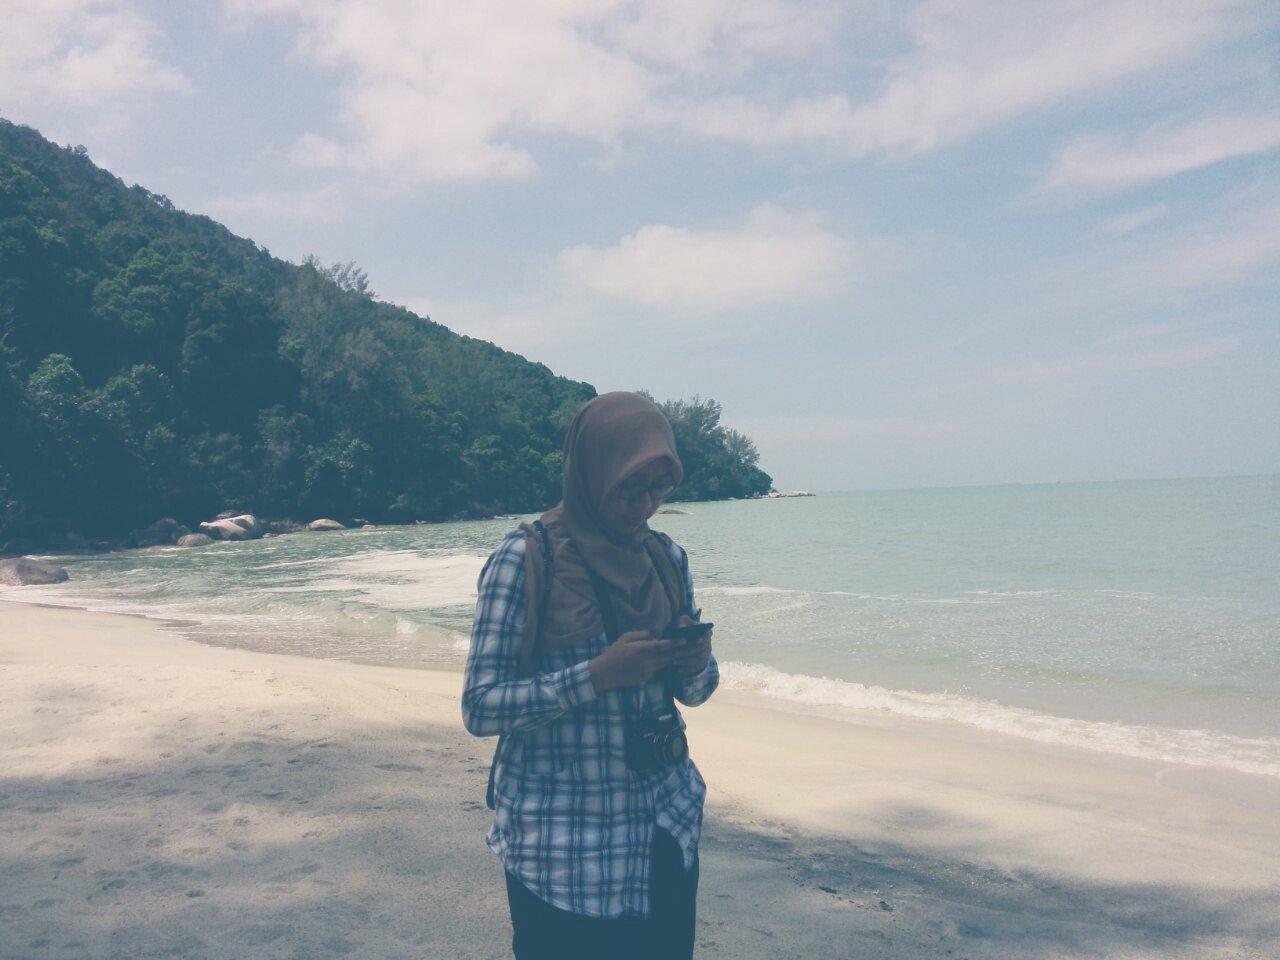 @khanmancung) • Instagram photos and videos